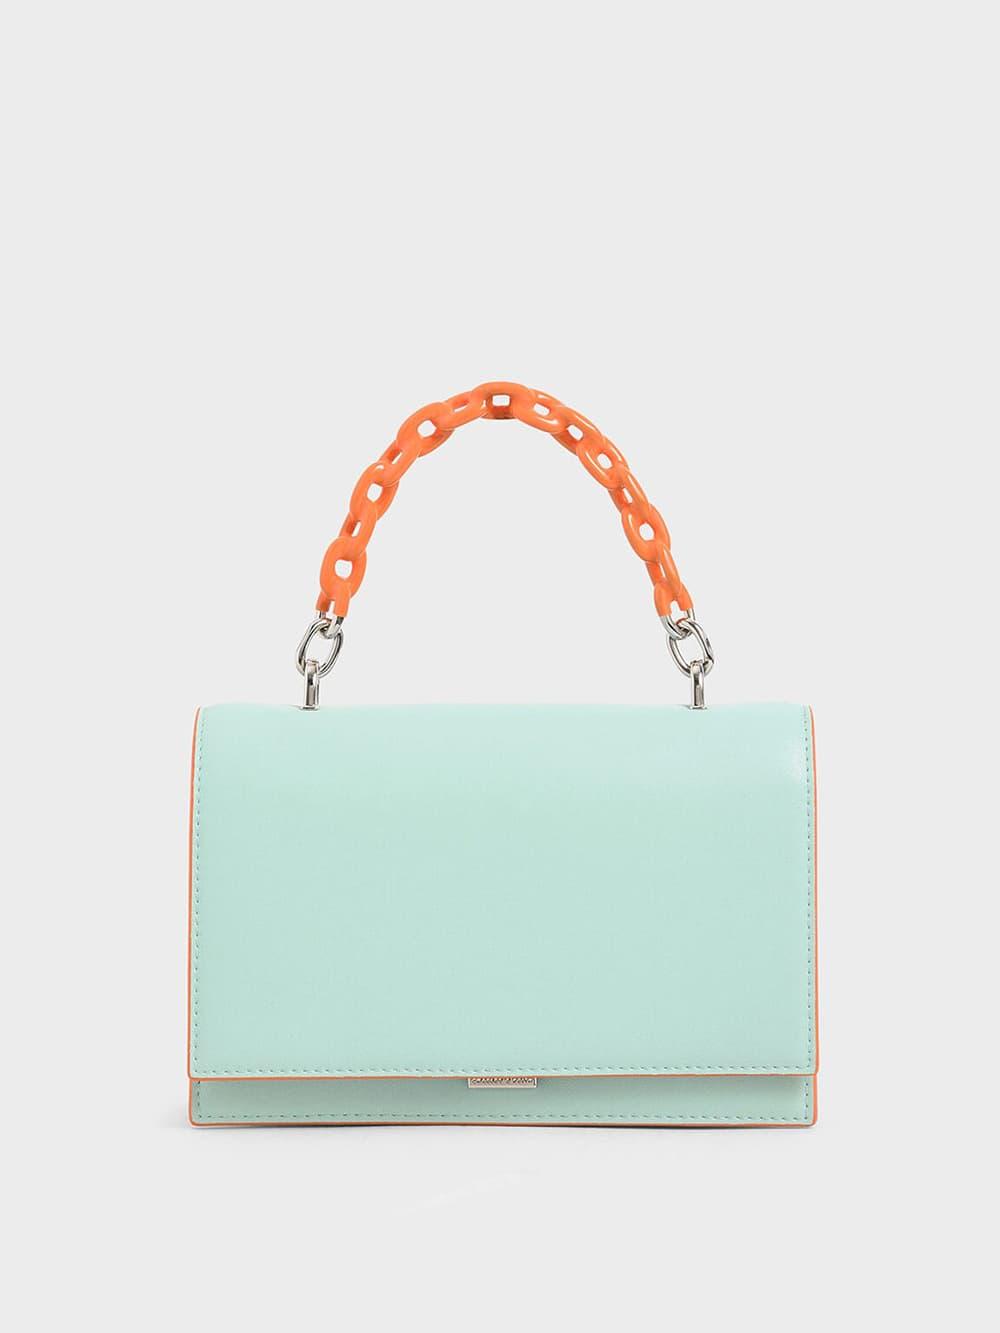 Two-Tone Chain Top Handle Bag